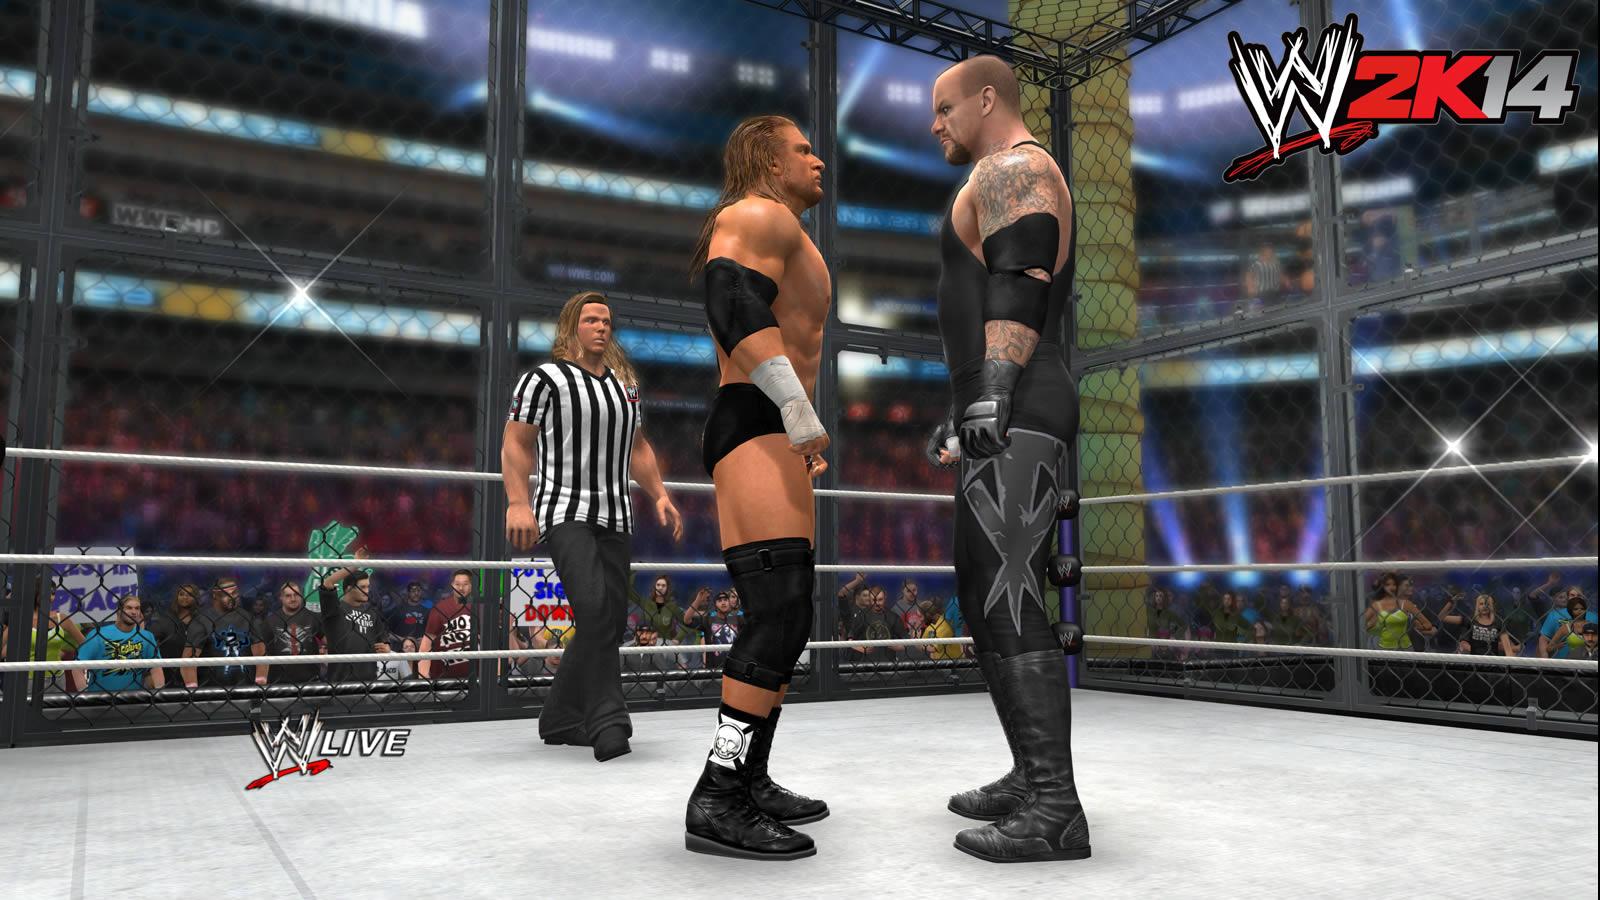 Imagenes WWE 2K14 XBOX 360